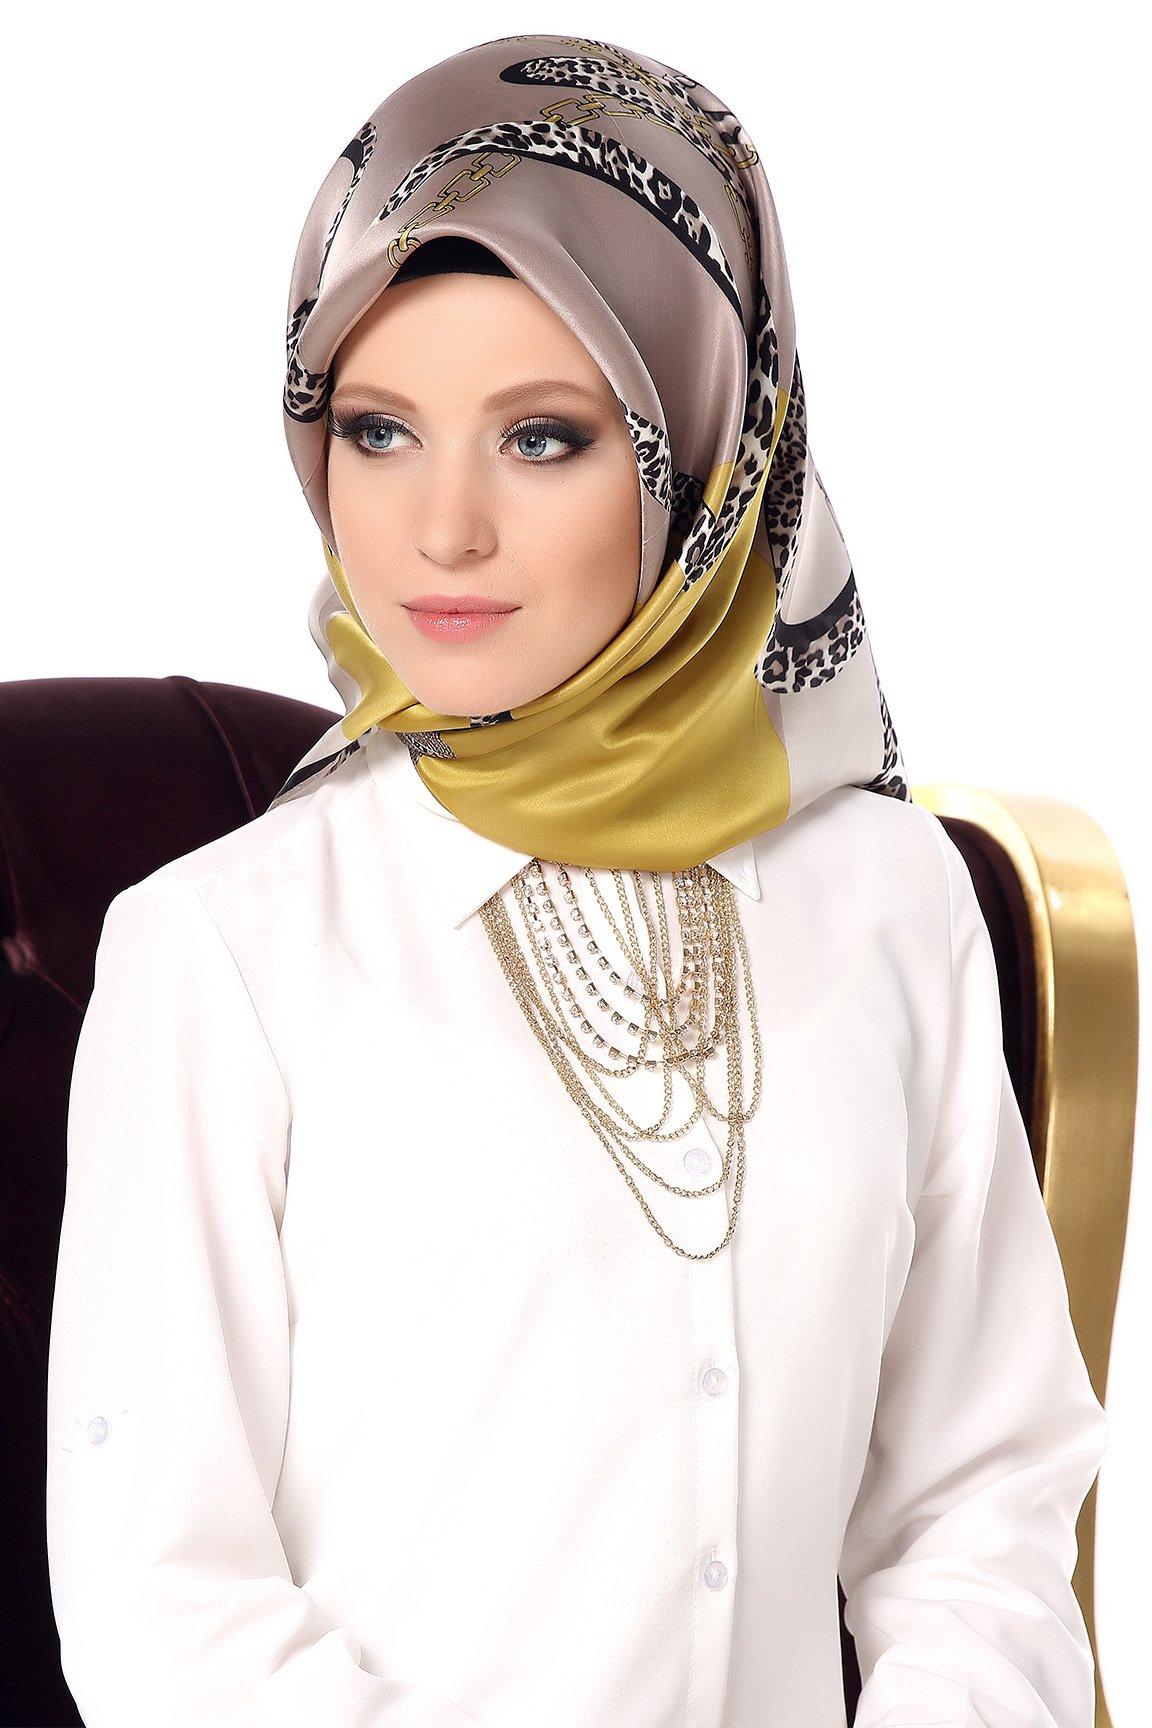 بالصور حجاب فاشون , بالصور اجدد كولكشن لحجاب فاشون 5783 9